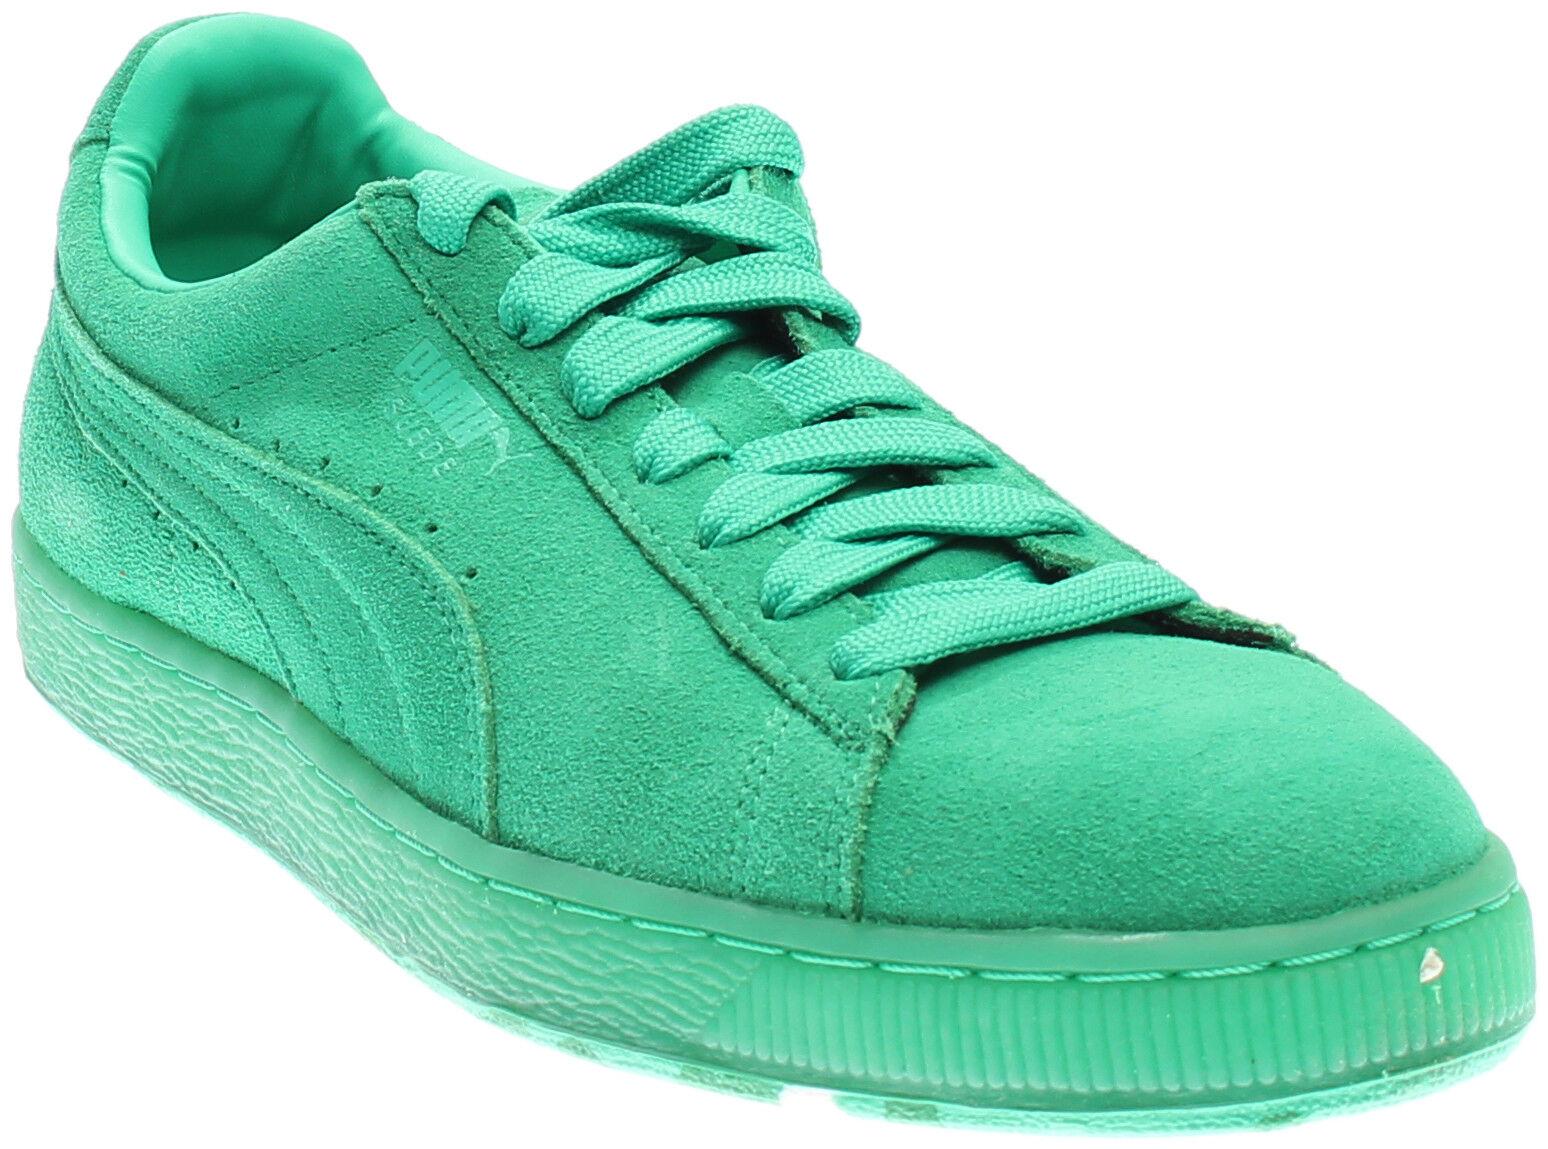 Puma verde Suede Classic Ice Mix verde Puma Hombre el modelo mas vendido de la marca cdea87